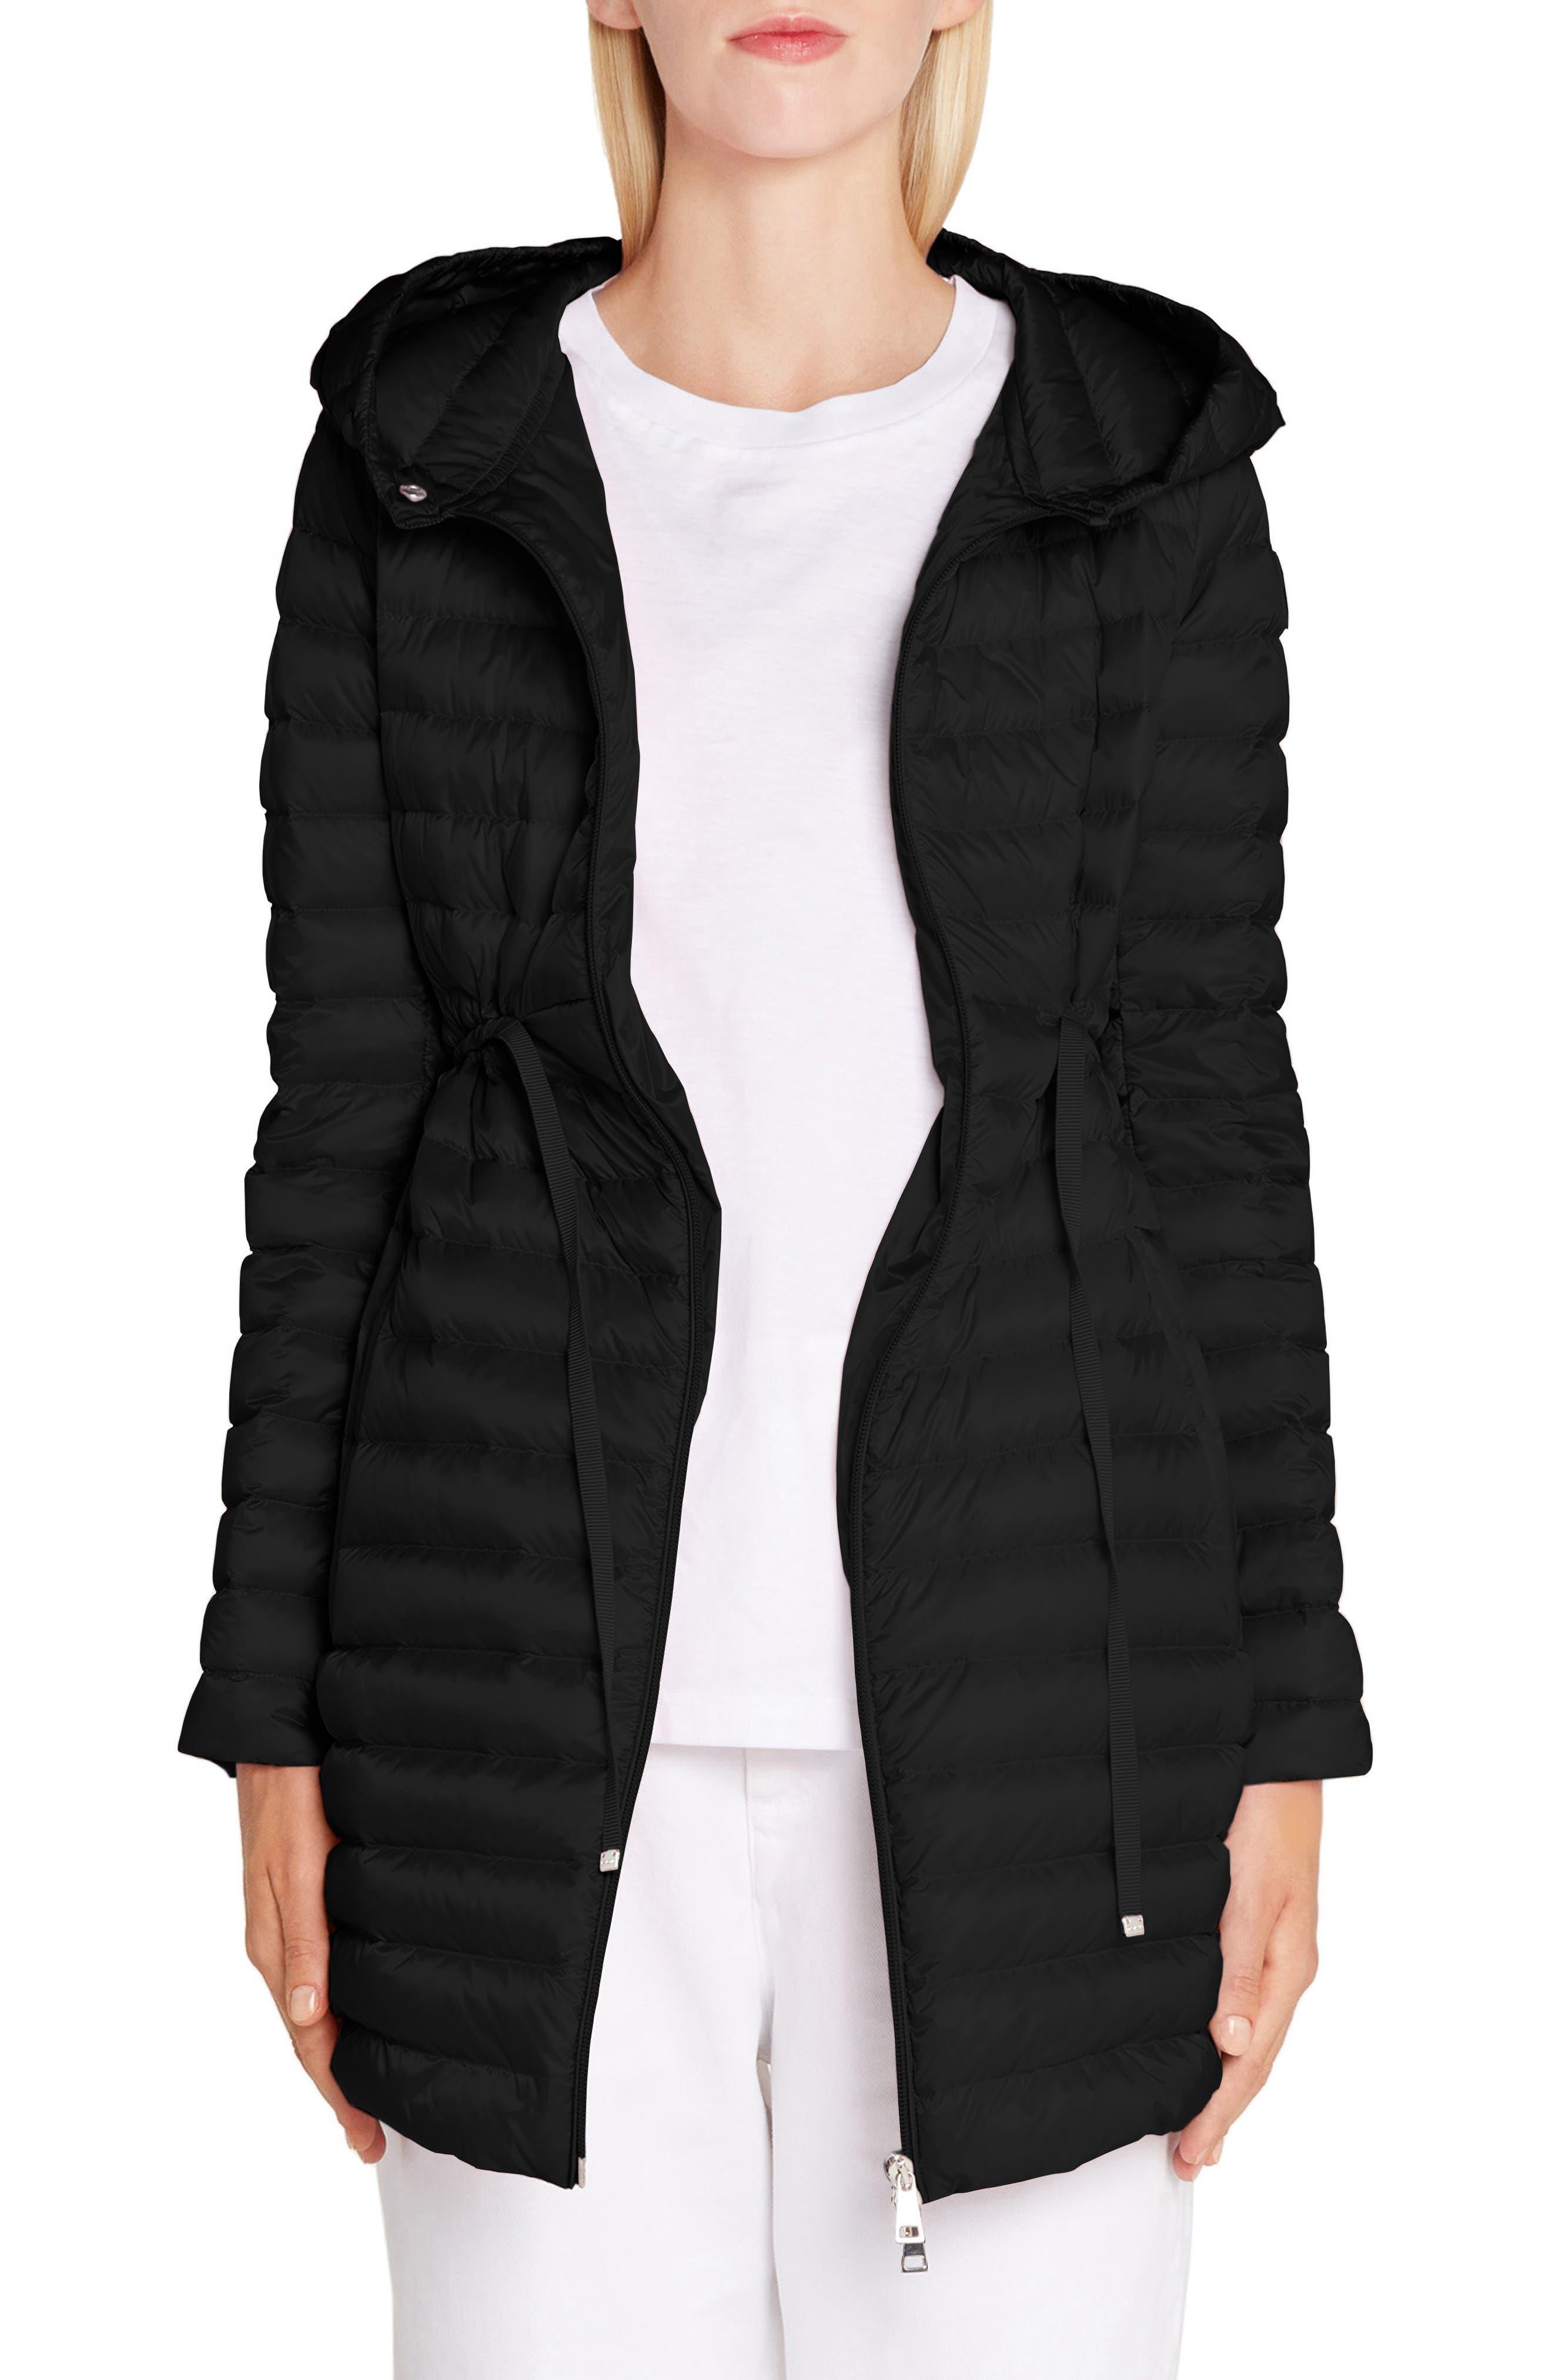 MONCLER Barbel Water Resistant Long Hooded Down Jacket, Main, color, 001